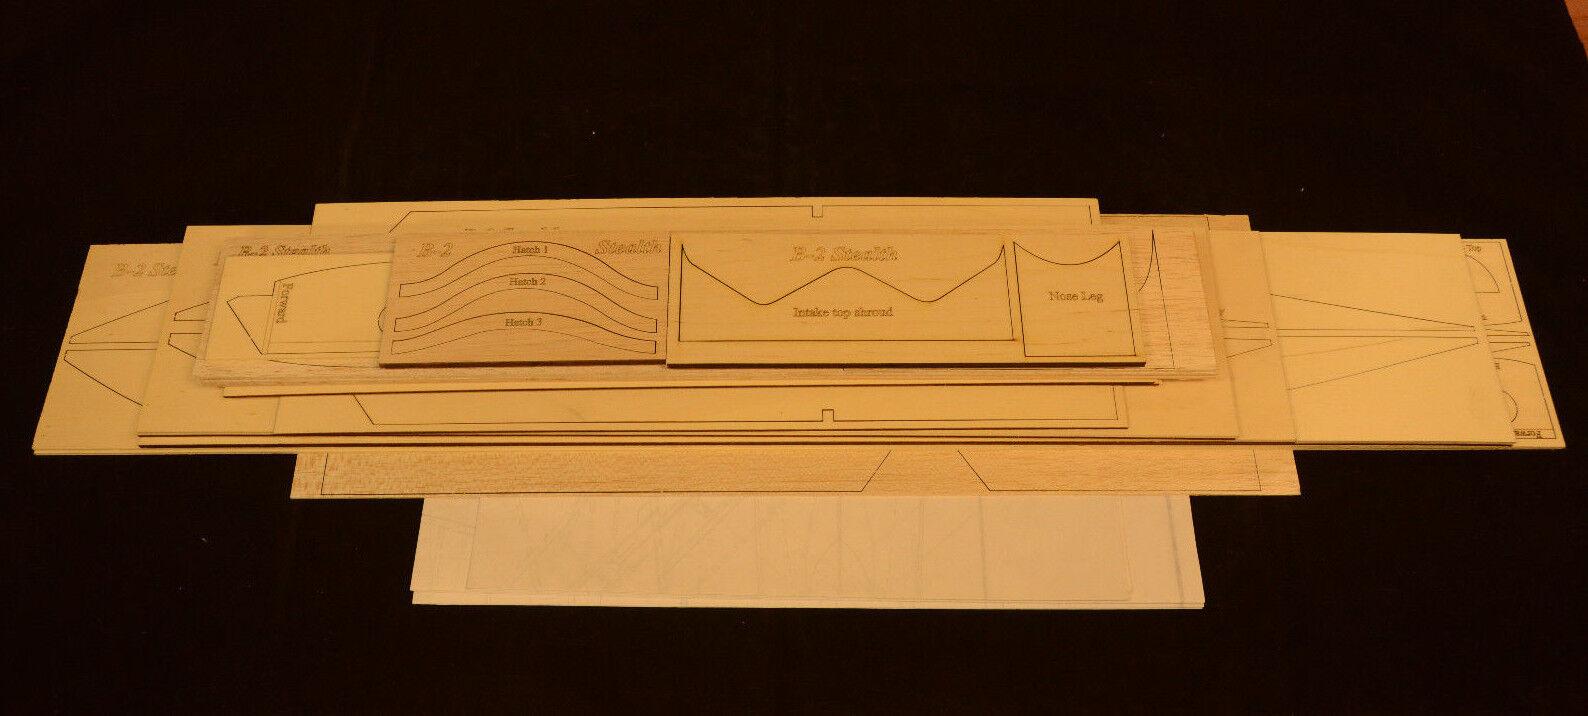 Giant Scale B-2 SPIRIT Laser Cut Short Kit, Plans & Instr 96 ws ELECTRIC POWER